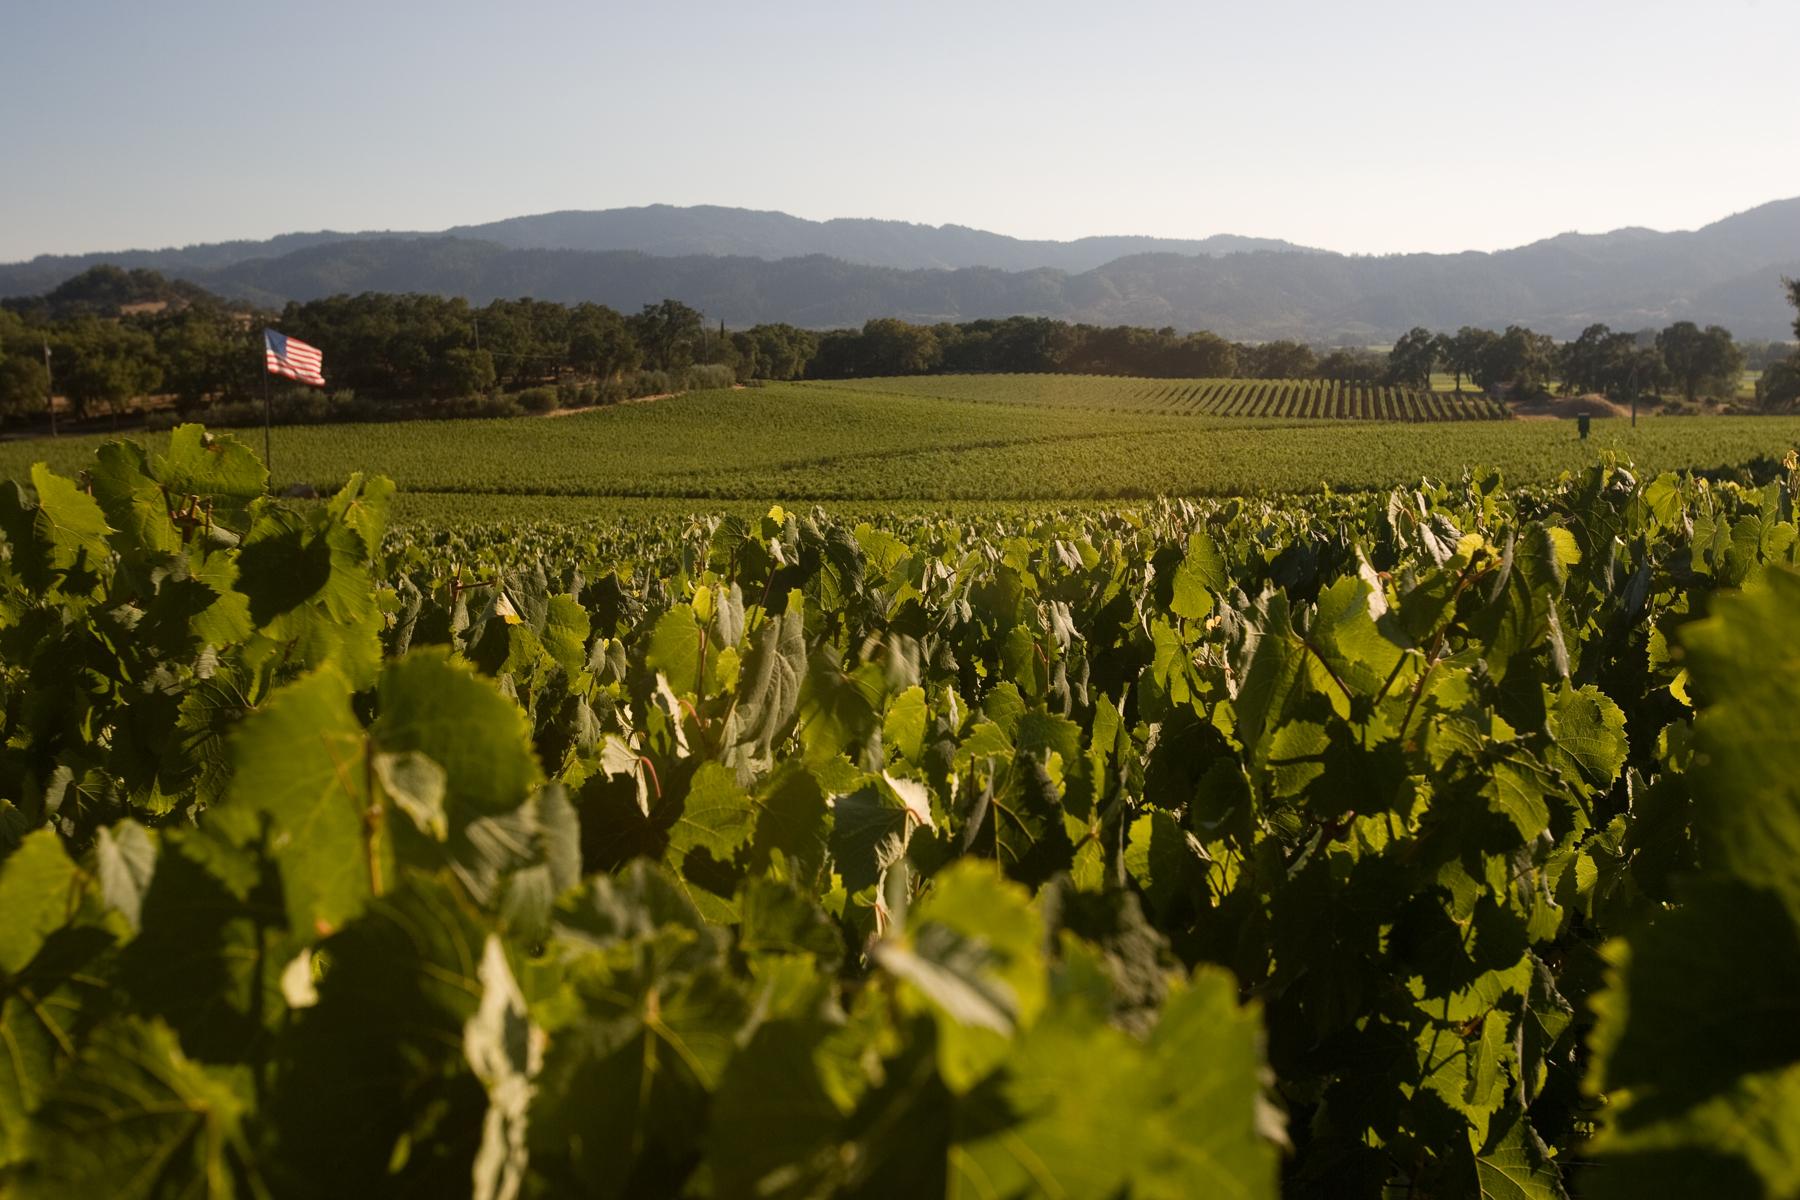 Rudd-vineyards-with-flag.jpg